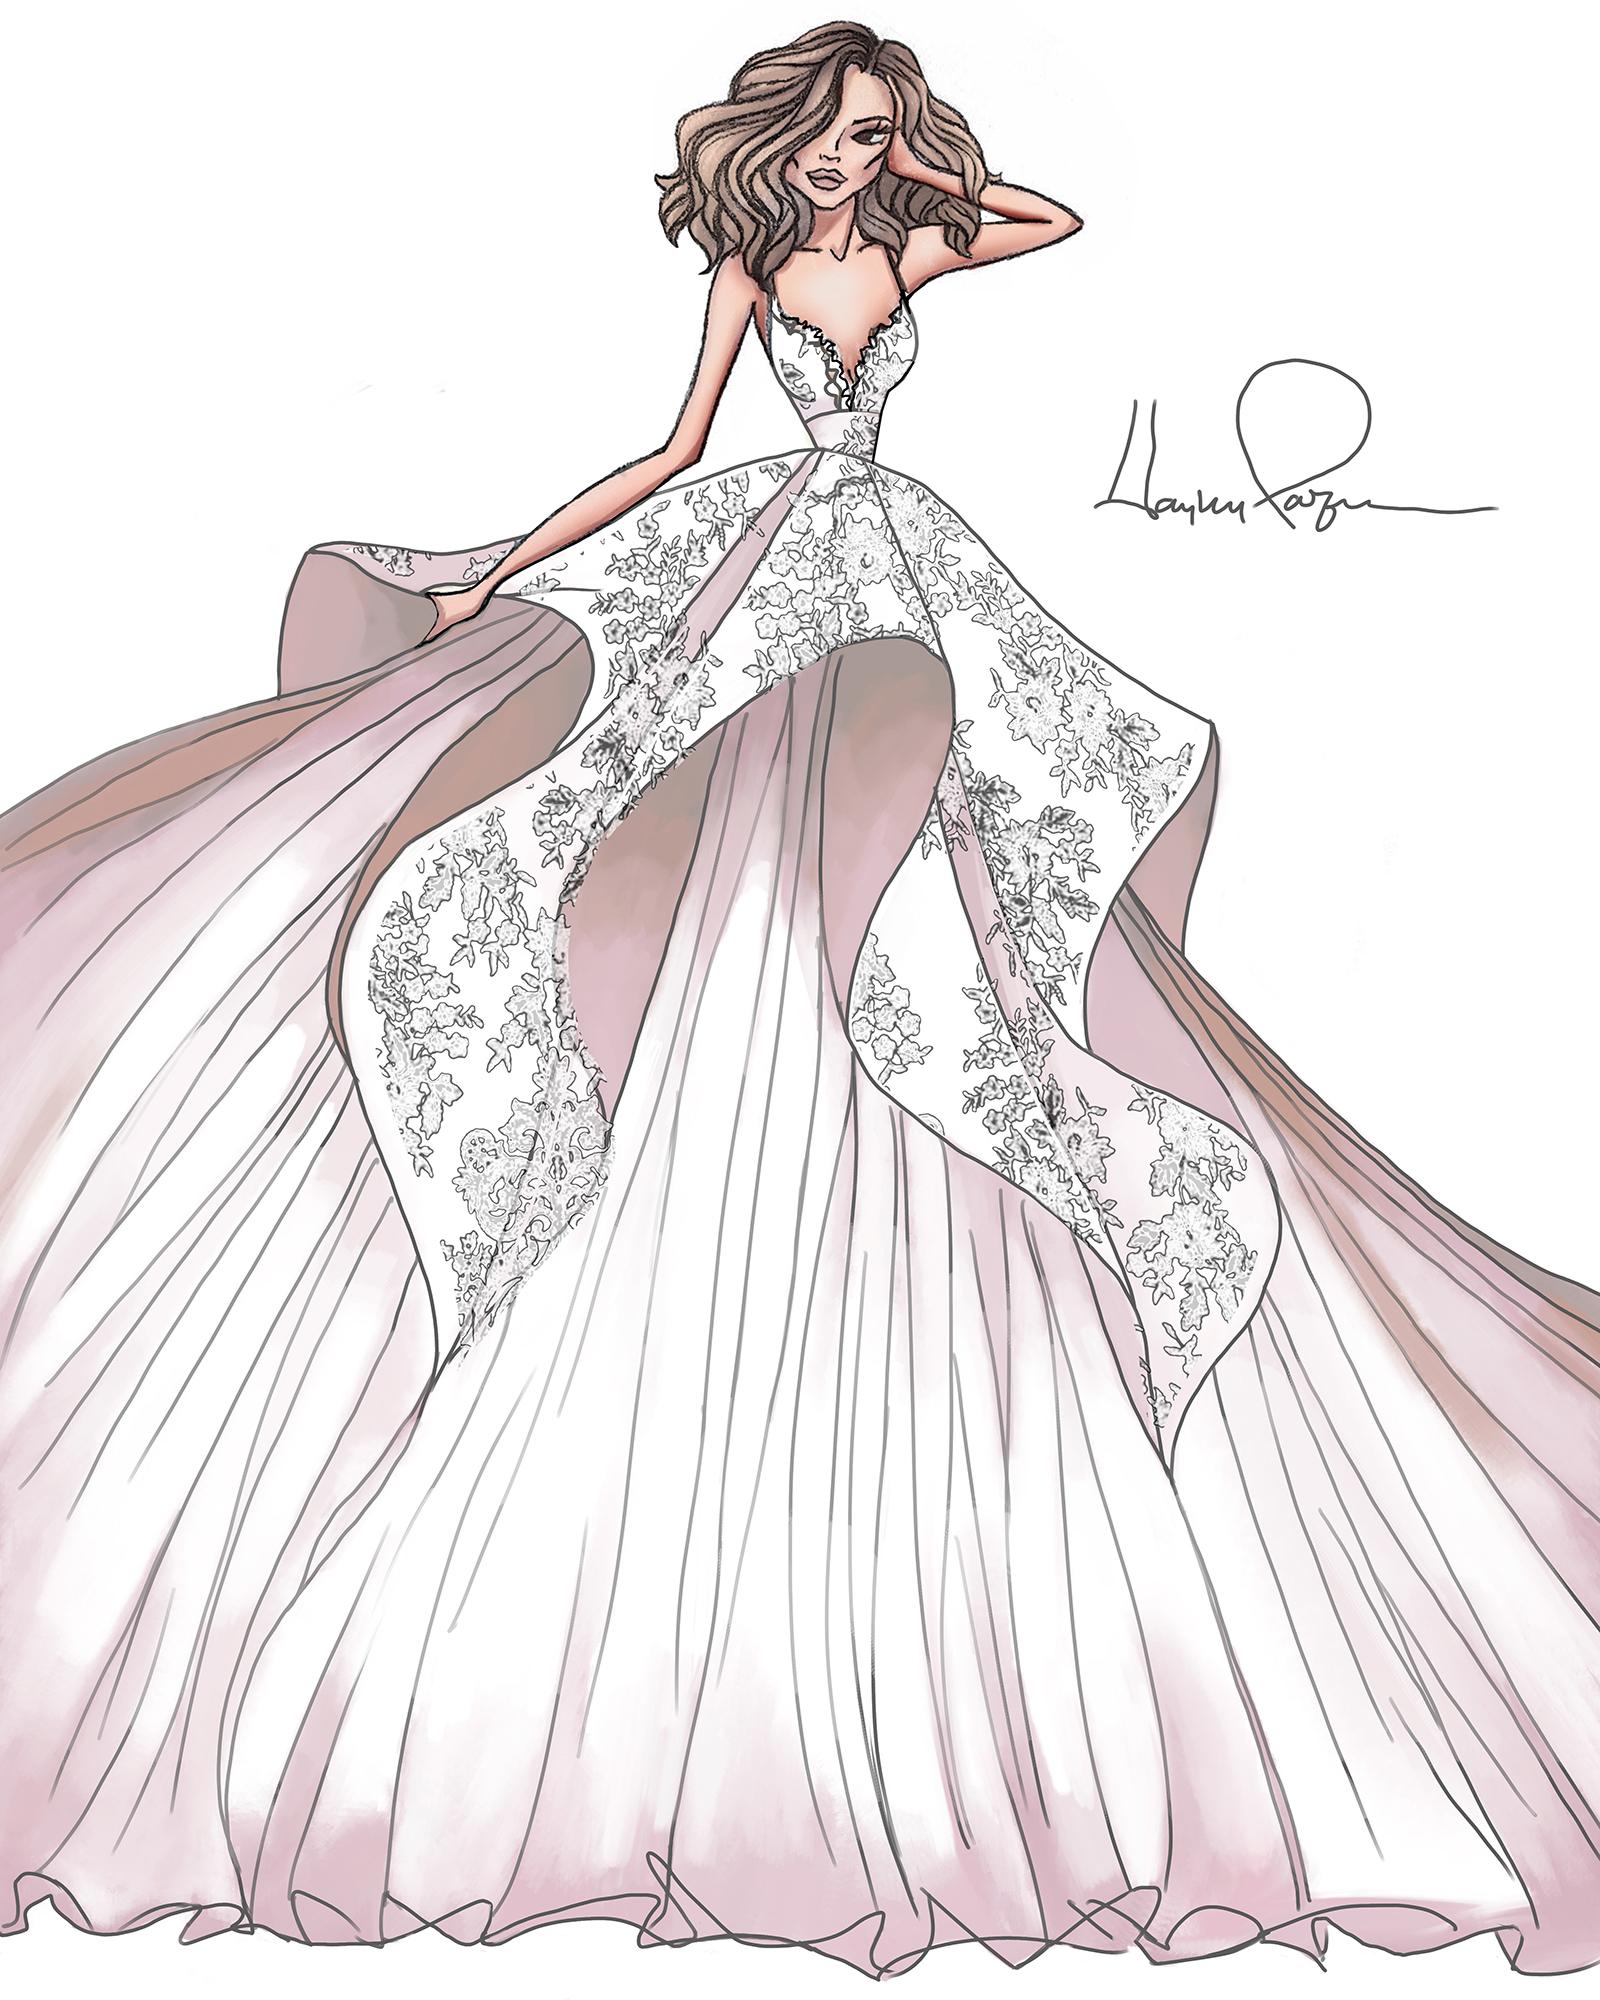 blush by hayley paige spring 2020 wedding dress sketch